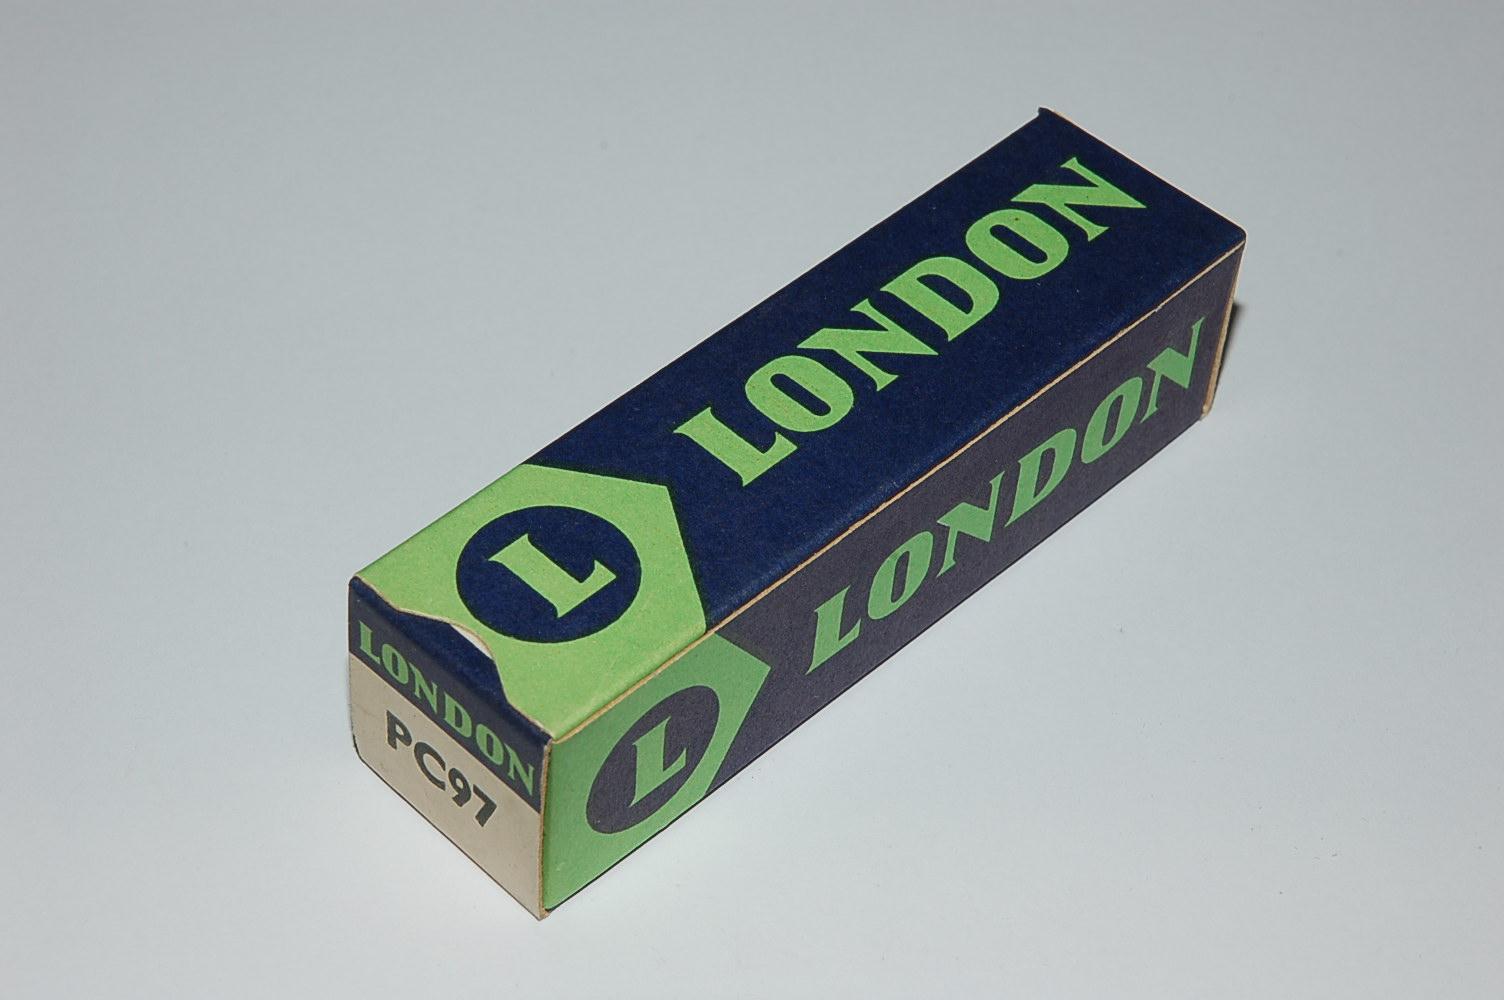 ArPC97_PC97-Roehre-Tube-London_DSC_0499